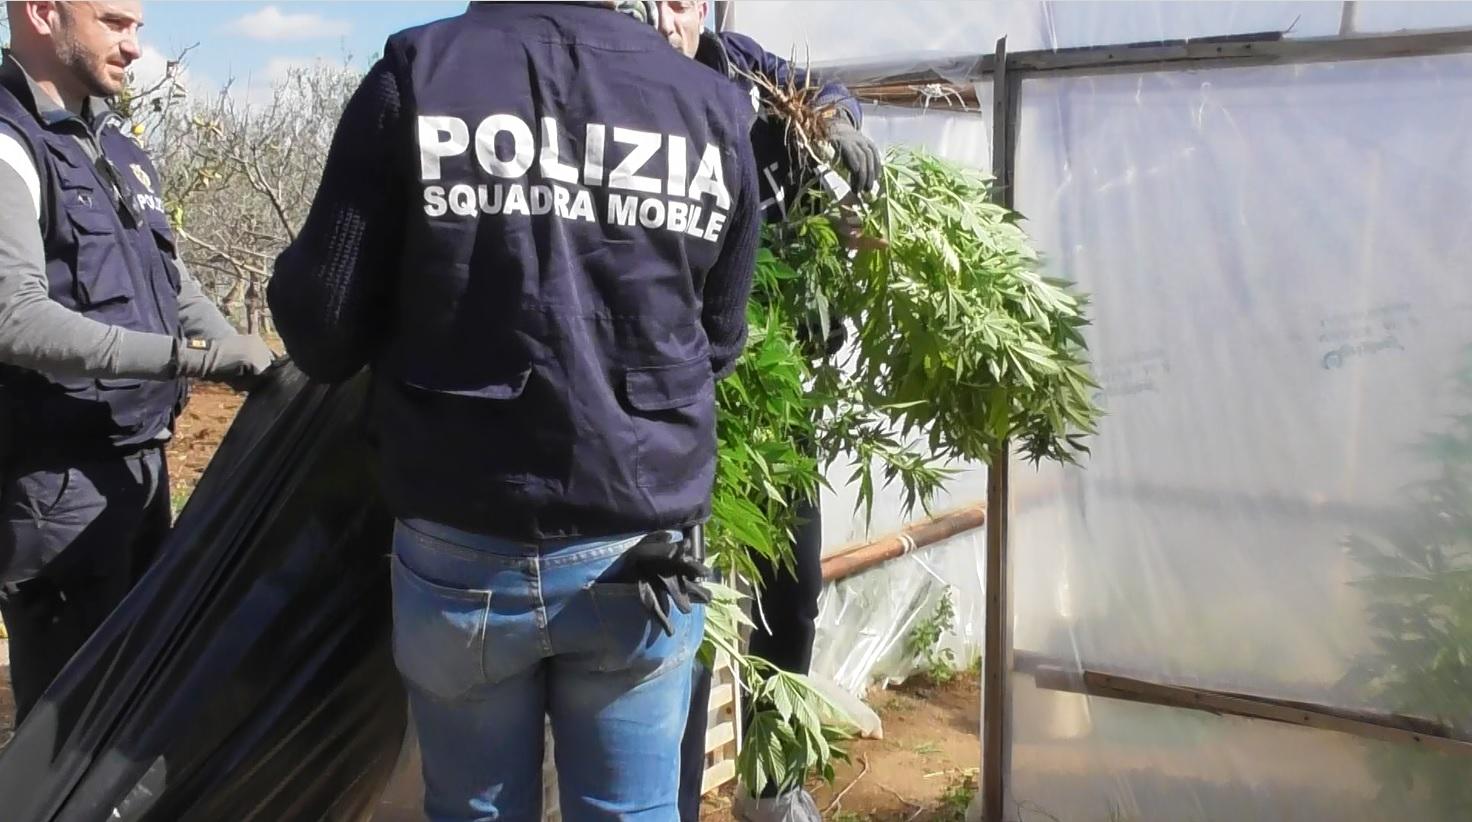 Padre e figlio spacciatori: arrestati a Vittoria, sequestrata una serra